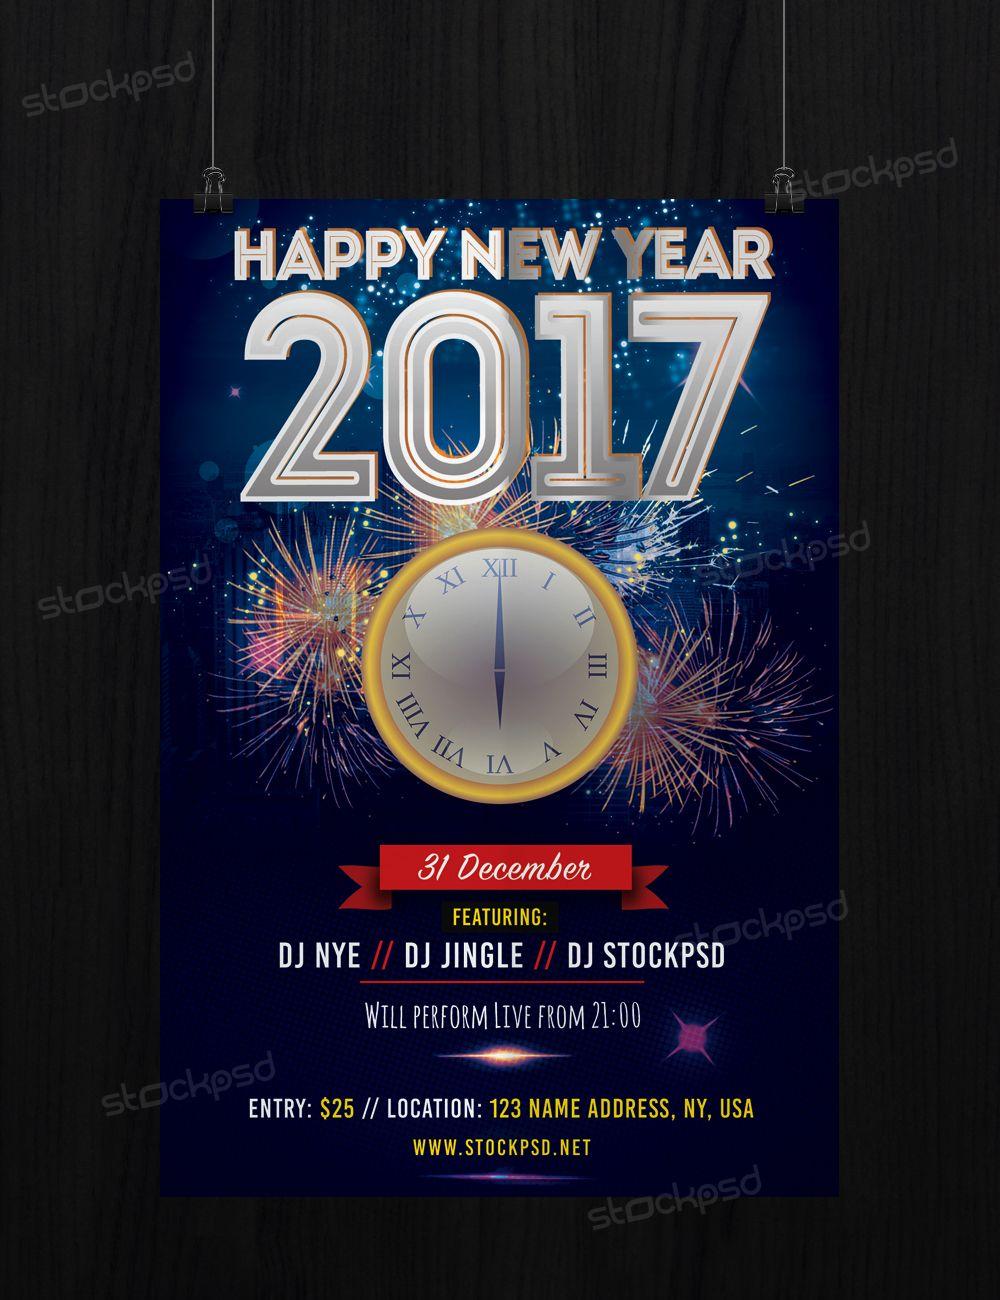 2017 free new years eve free psd flyer template psd flyers 2017 free new years eve free psd flyer template saigontimesfo